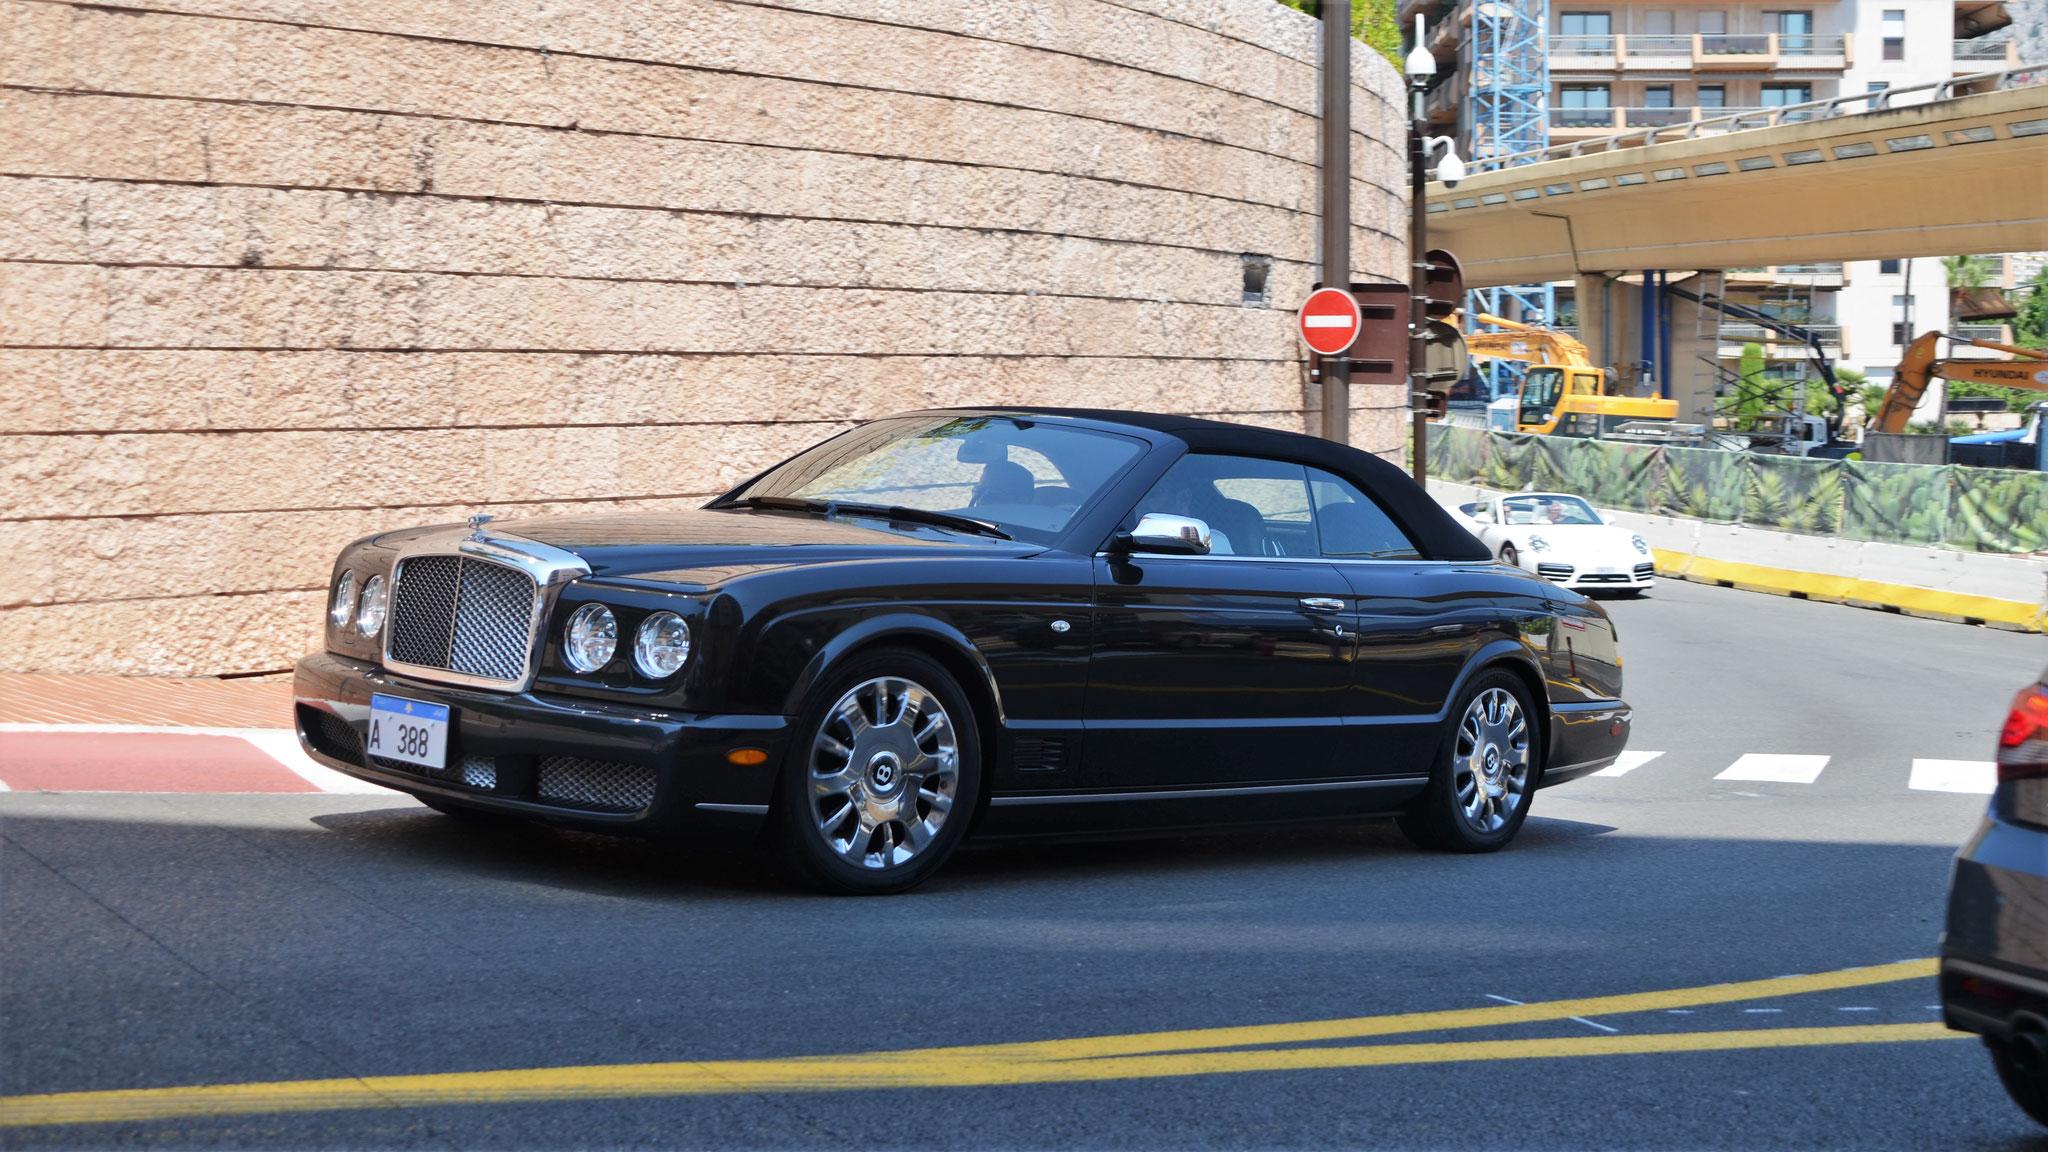 Bentley Azure - A-388 (Arab)